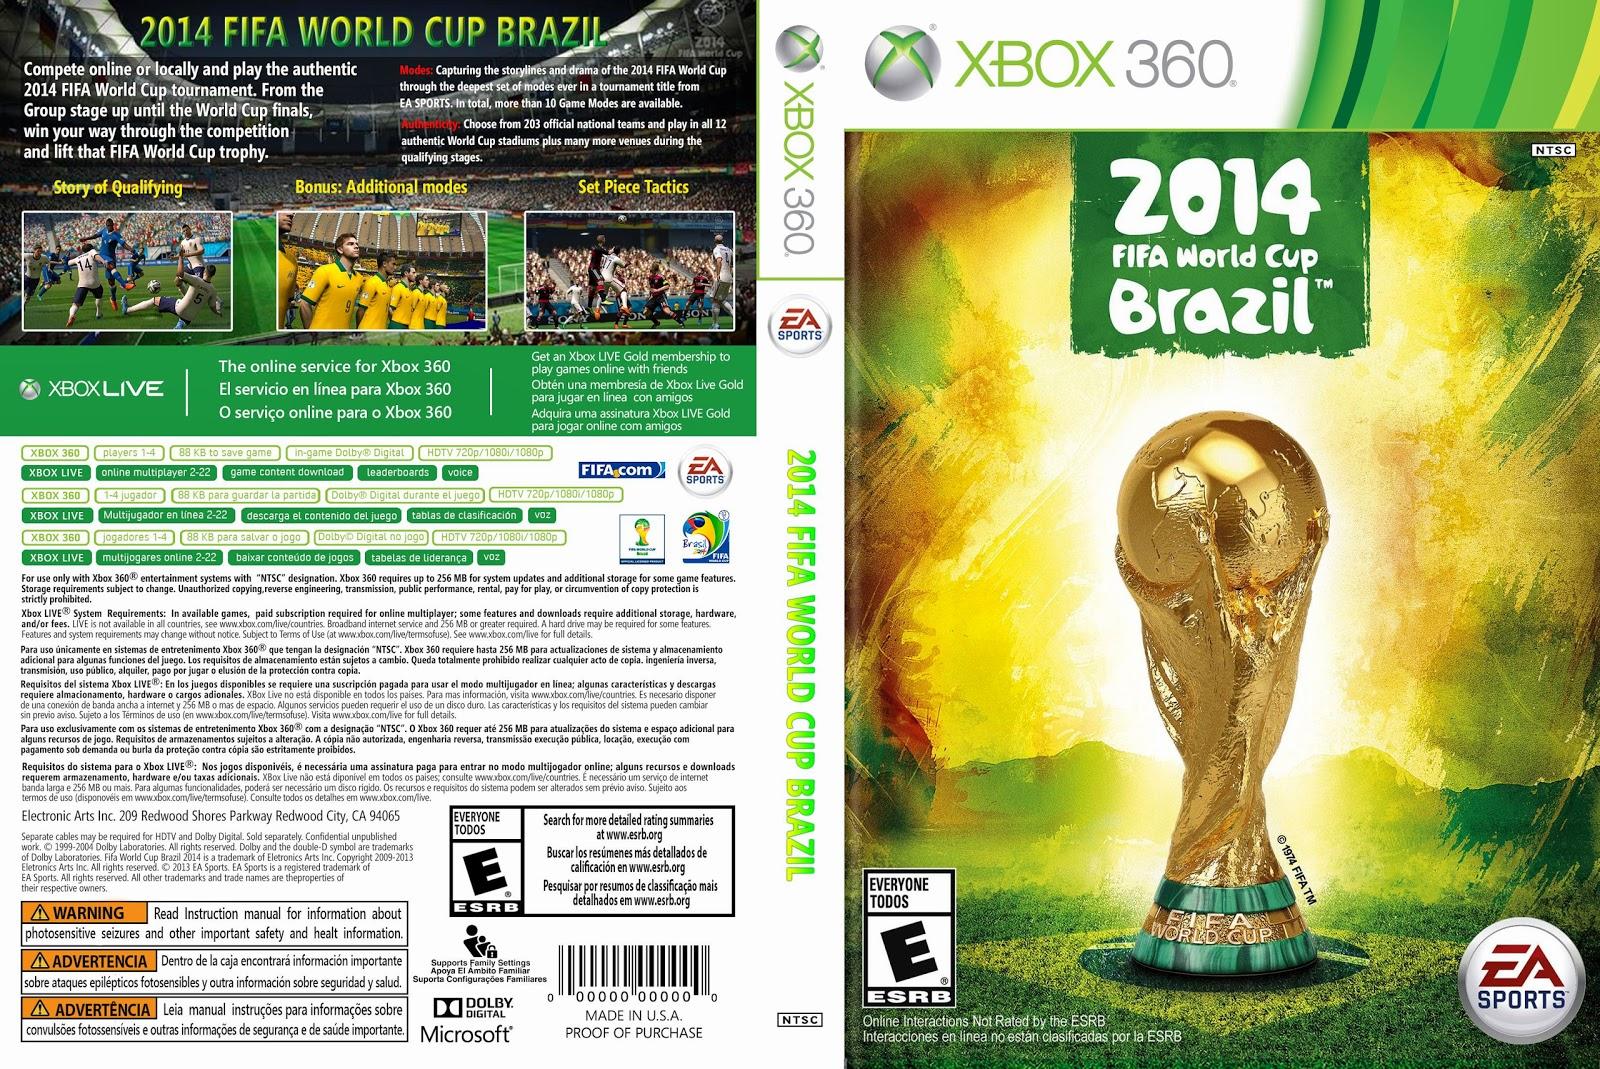 Capa 2014 Fifa World Cup Brazil Xbox 360